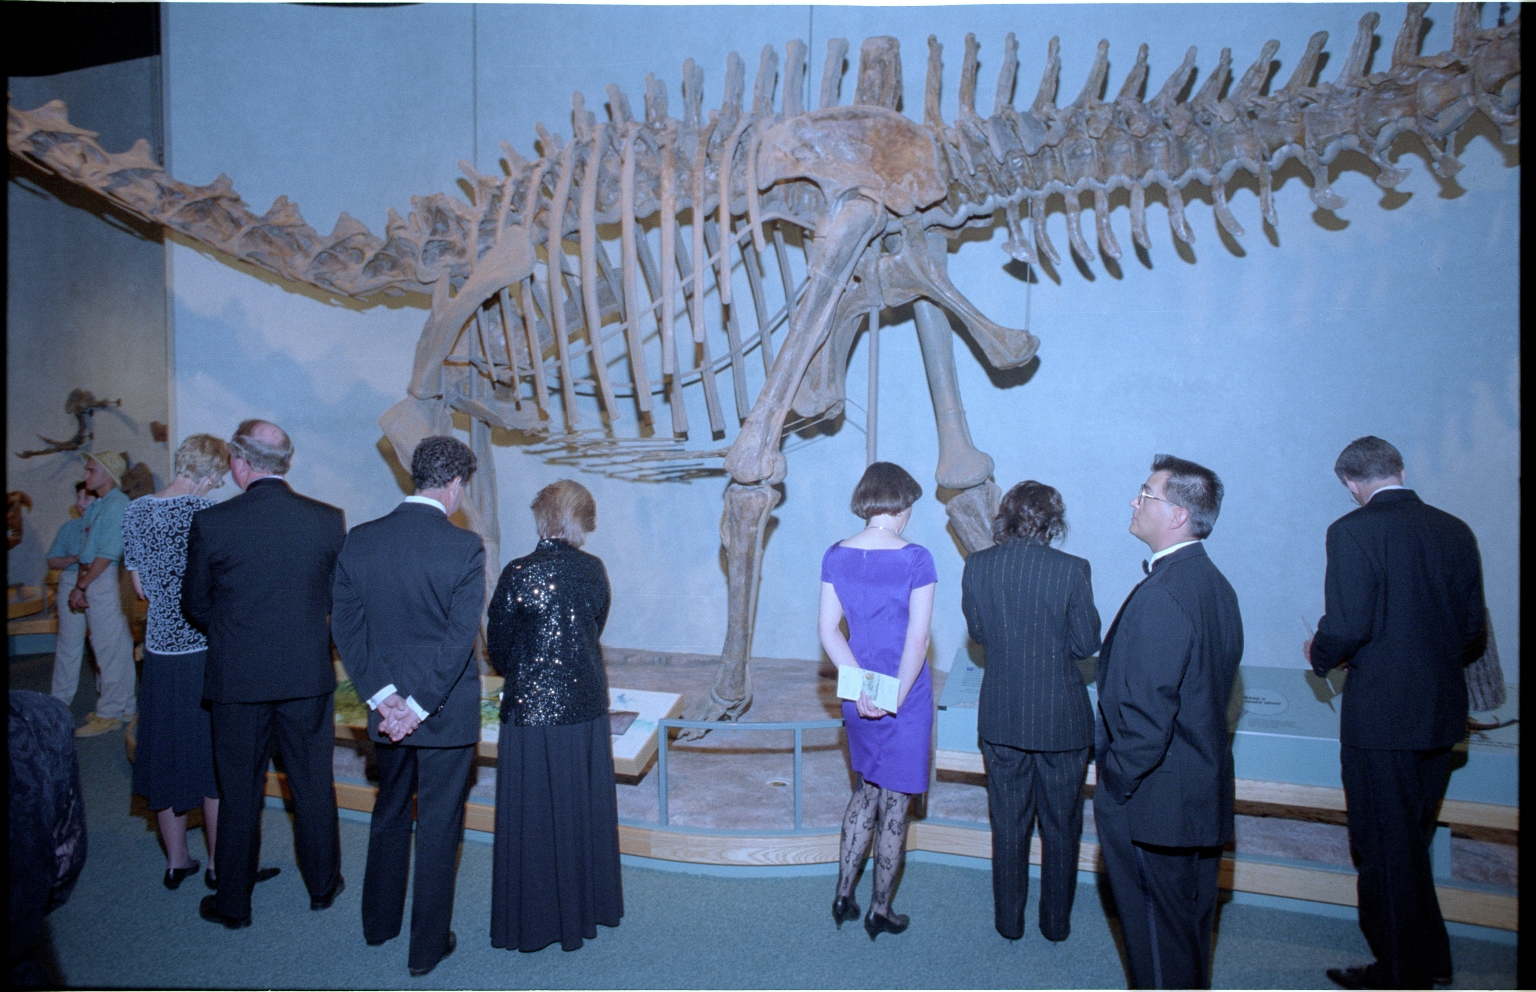 Prehistoric Journey Exhihibit preparation and construction